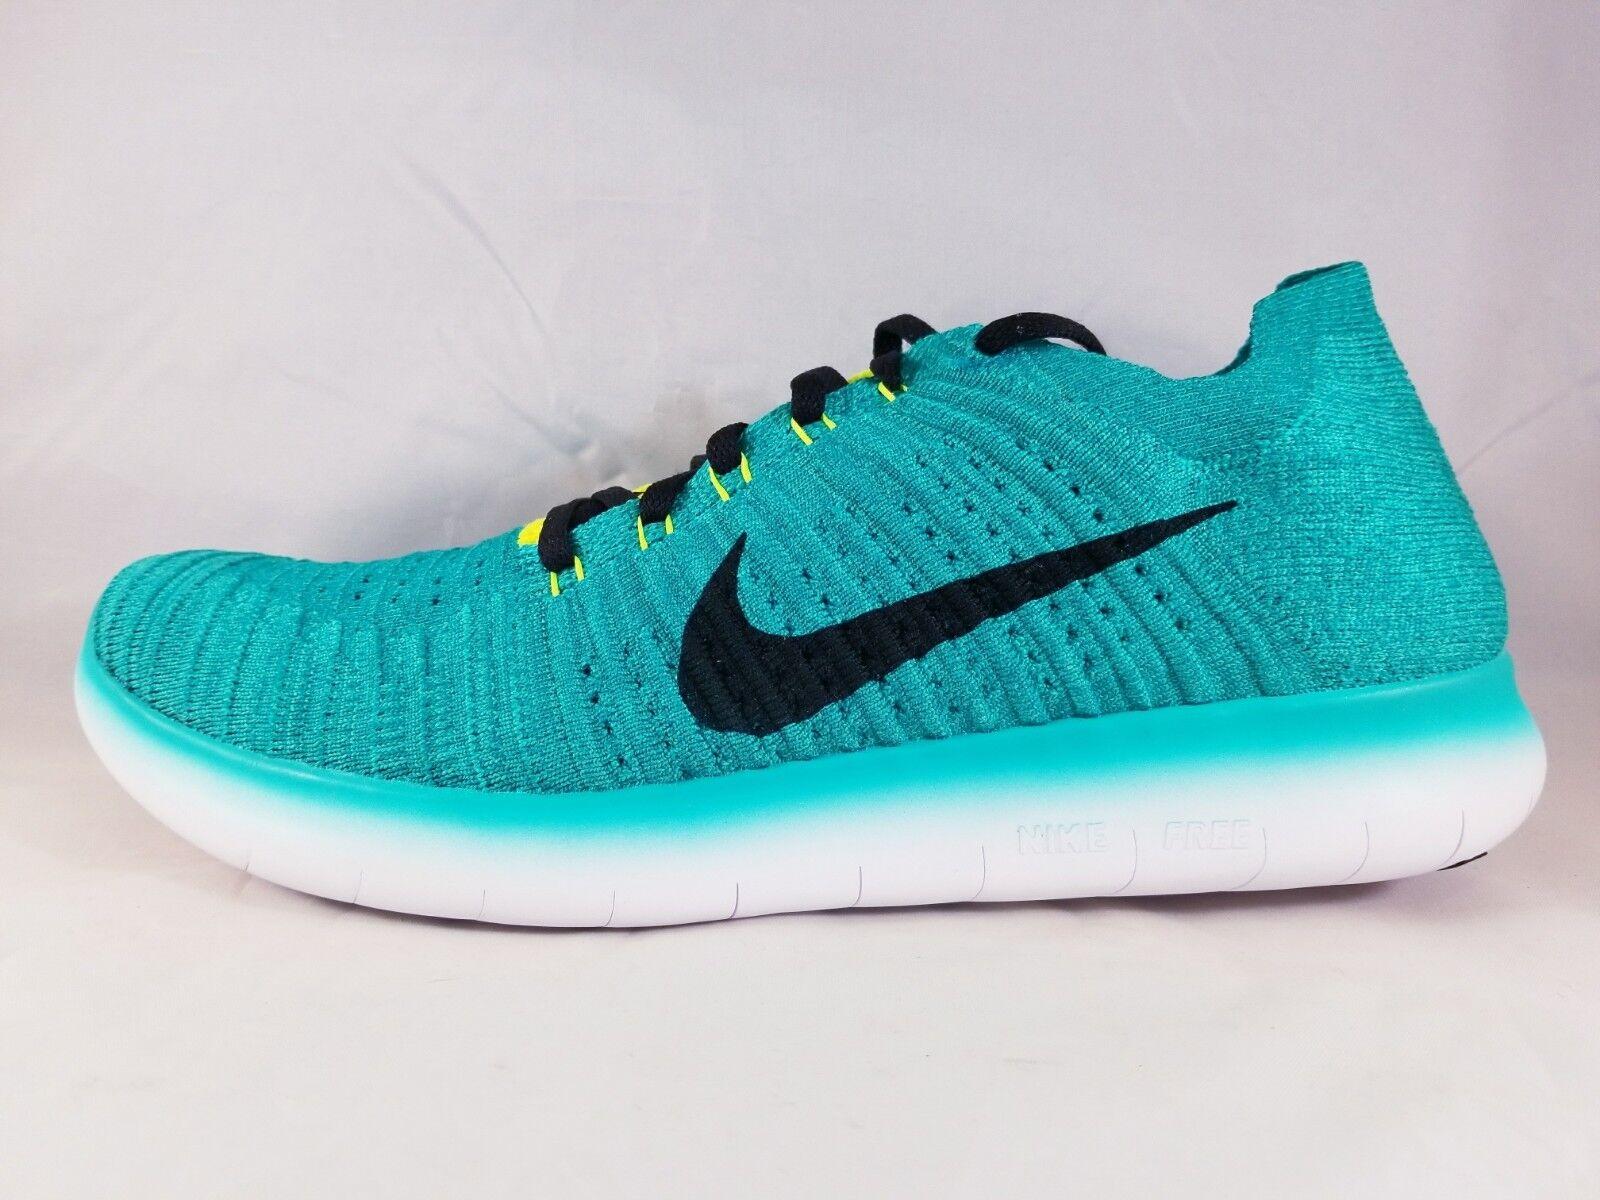 Nike Free RN Flynit Men's Running Shoe 831069 303 Size 9.5